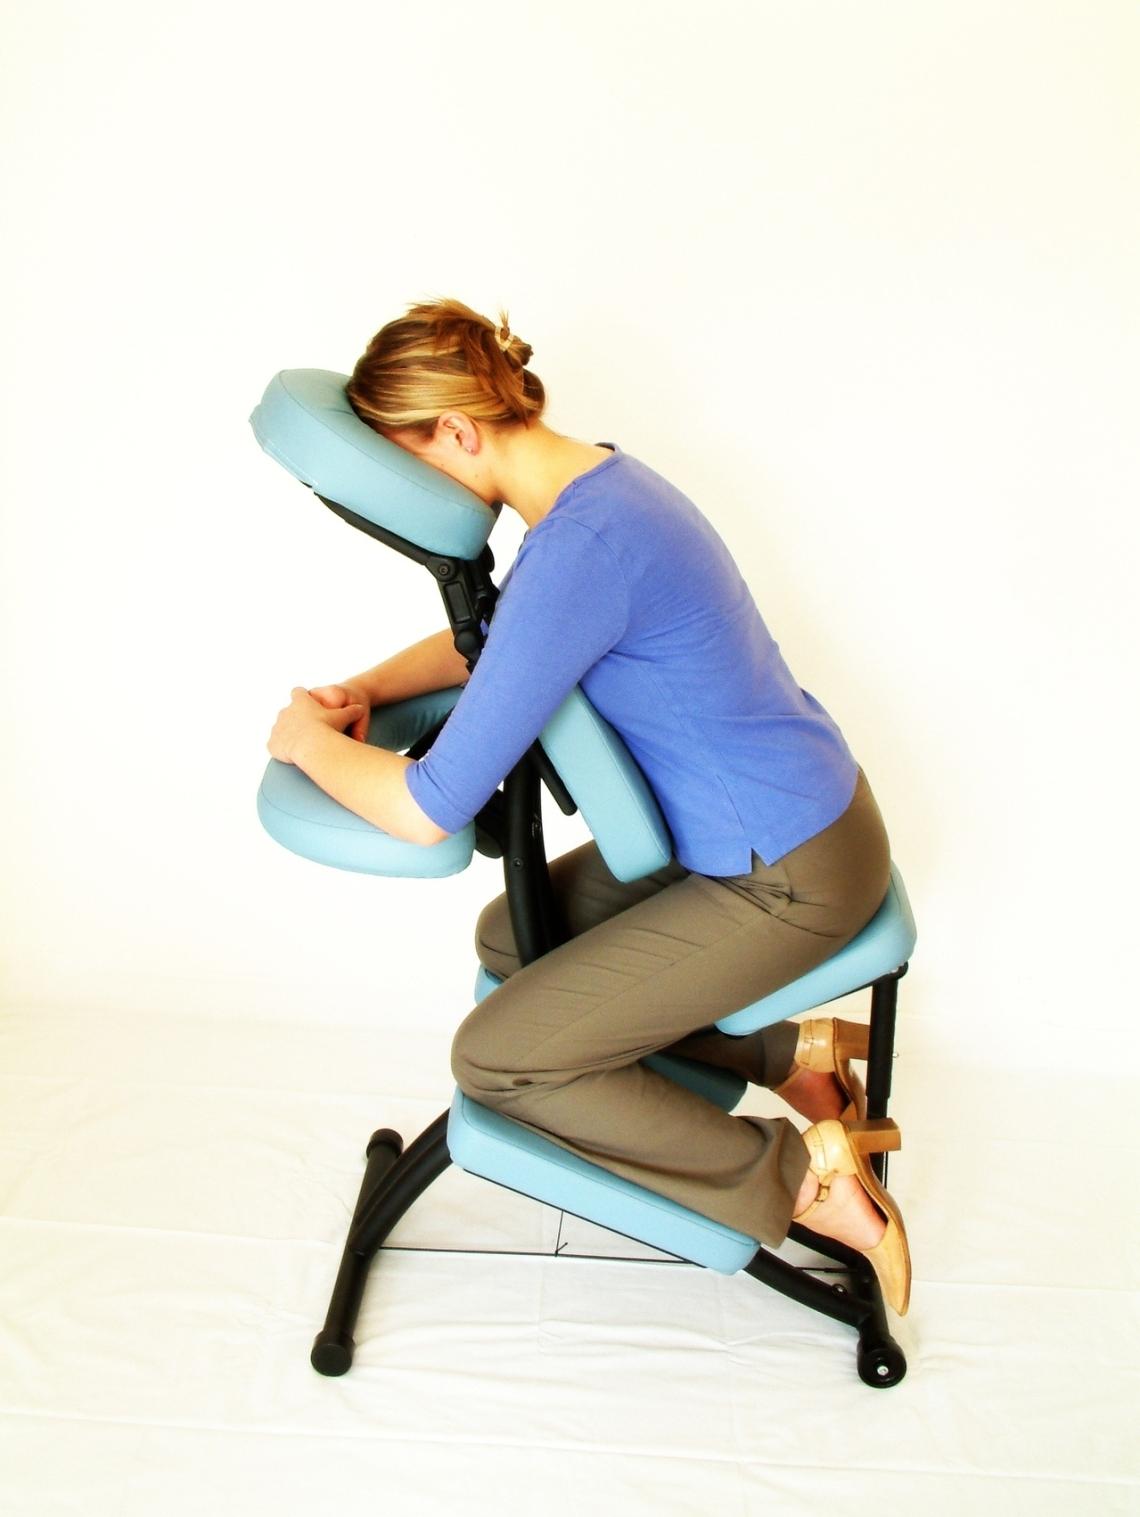 massage-chair-1479054-1279x1702.jpg